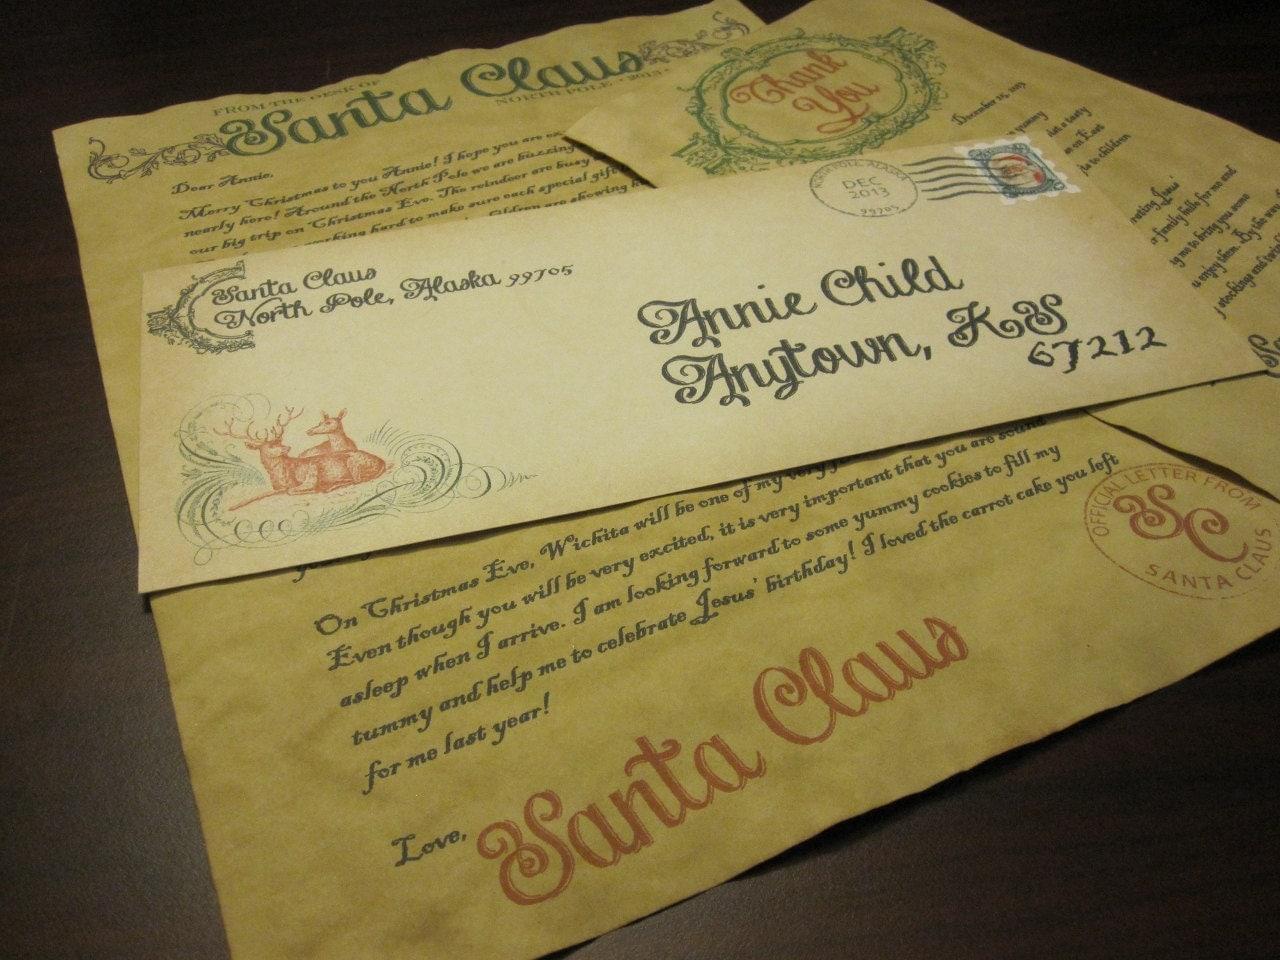 Generic Letter From Santa Santa Letter From Santa Claus On Vintage Paper Generic Santa